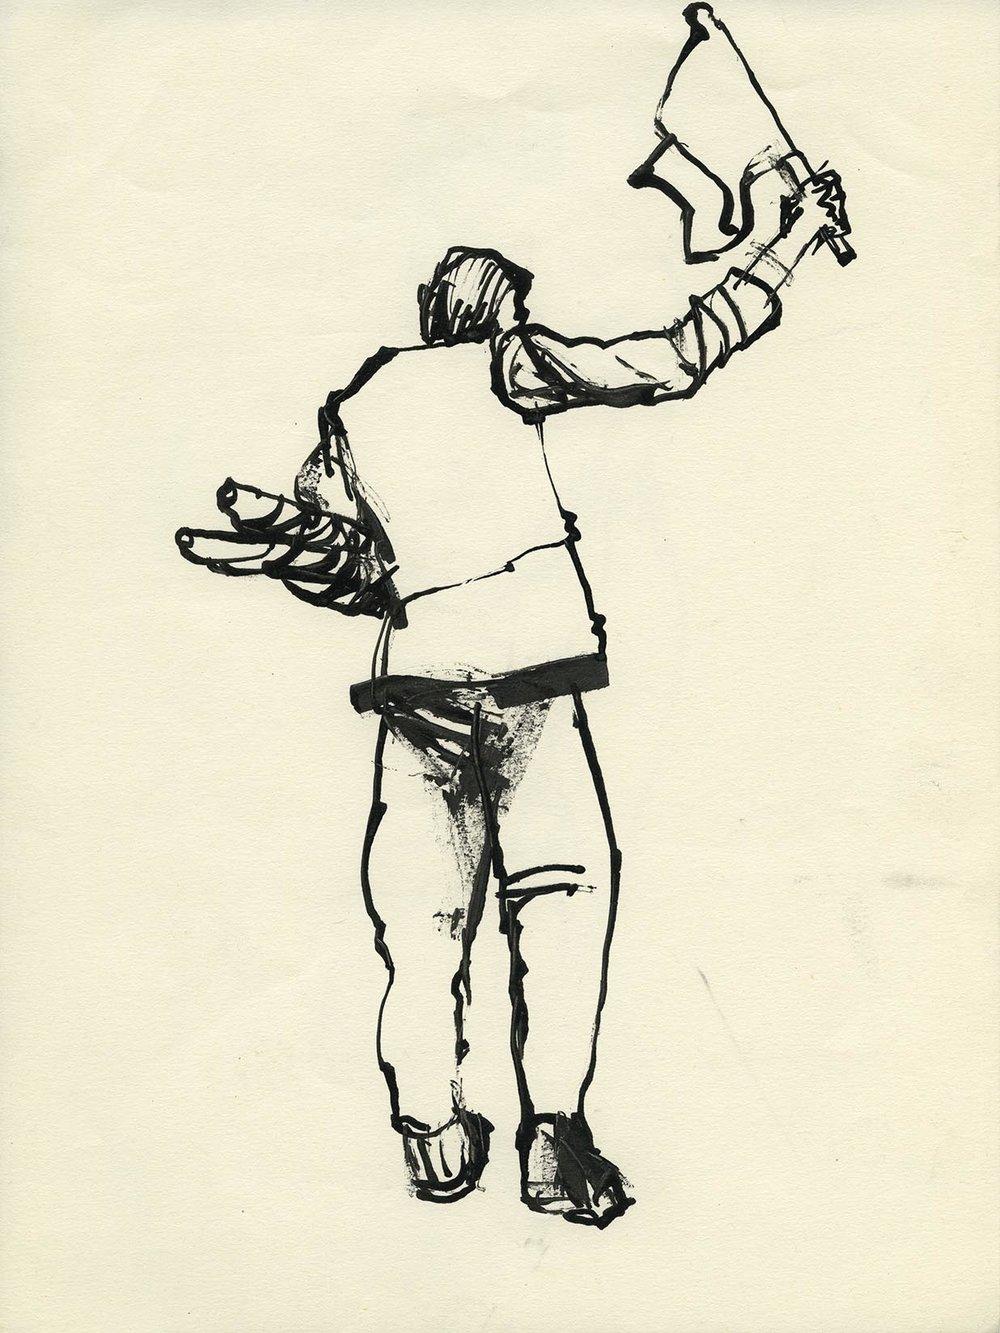 'Signalman' Ink drawing Image 16x22cm Mount 30x40cm £195